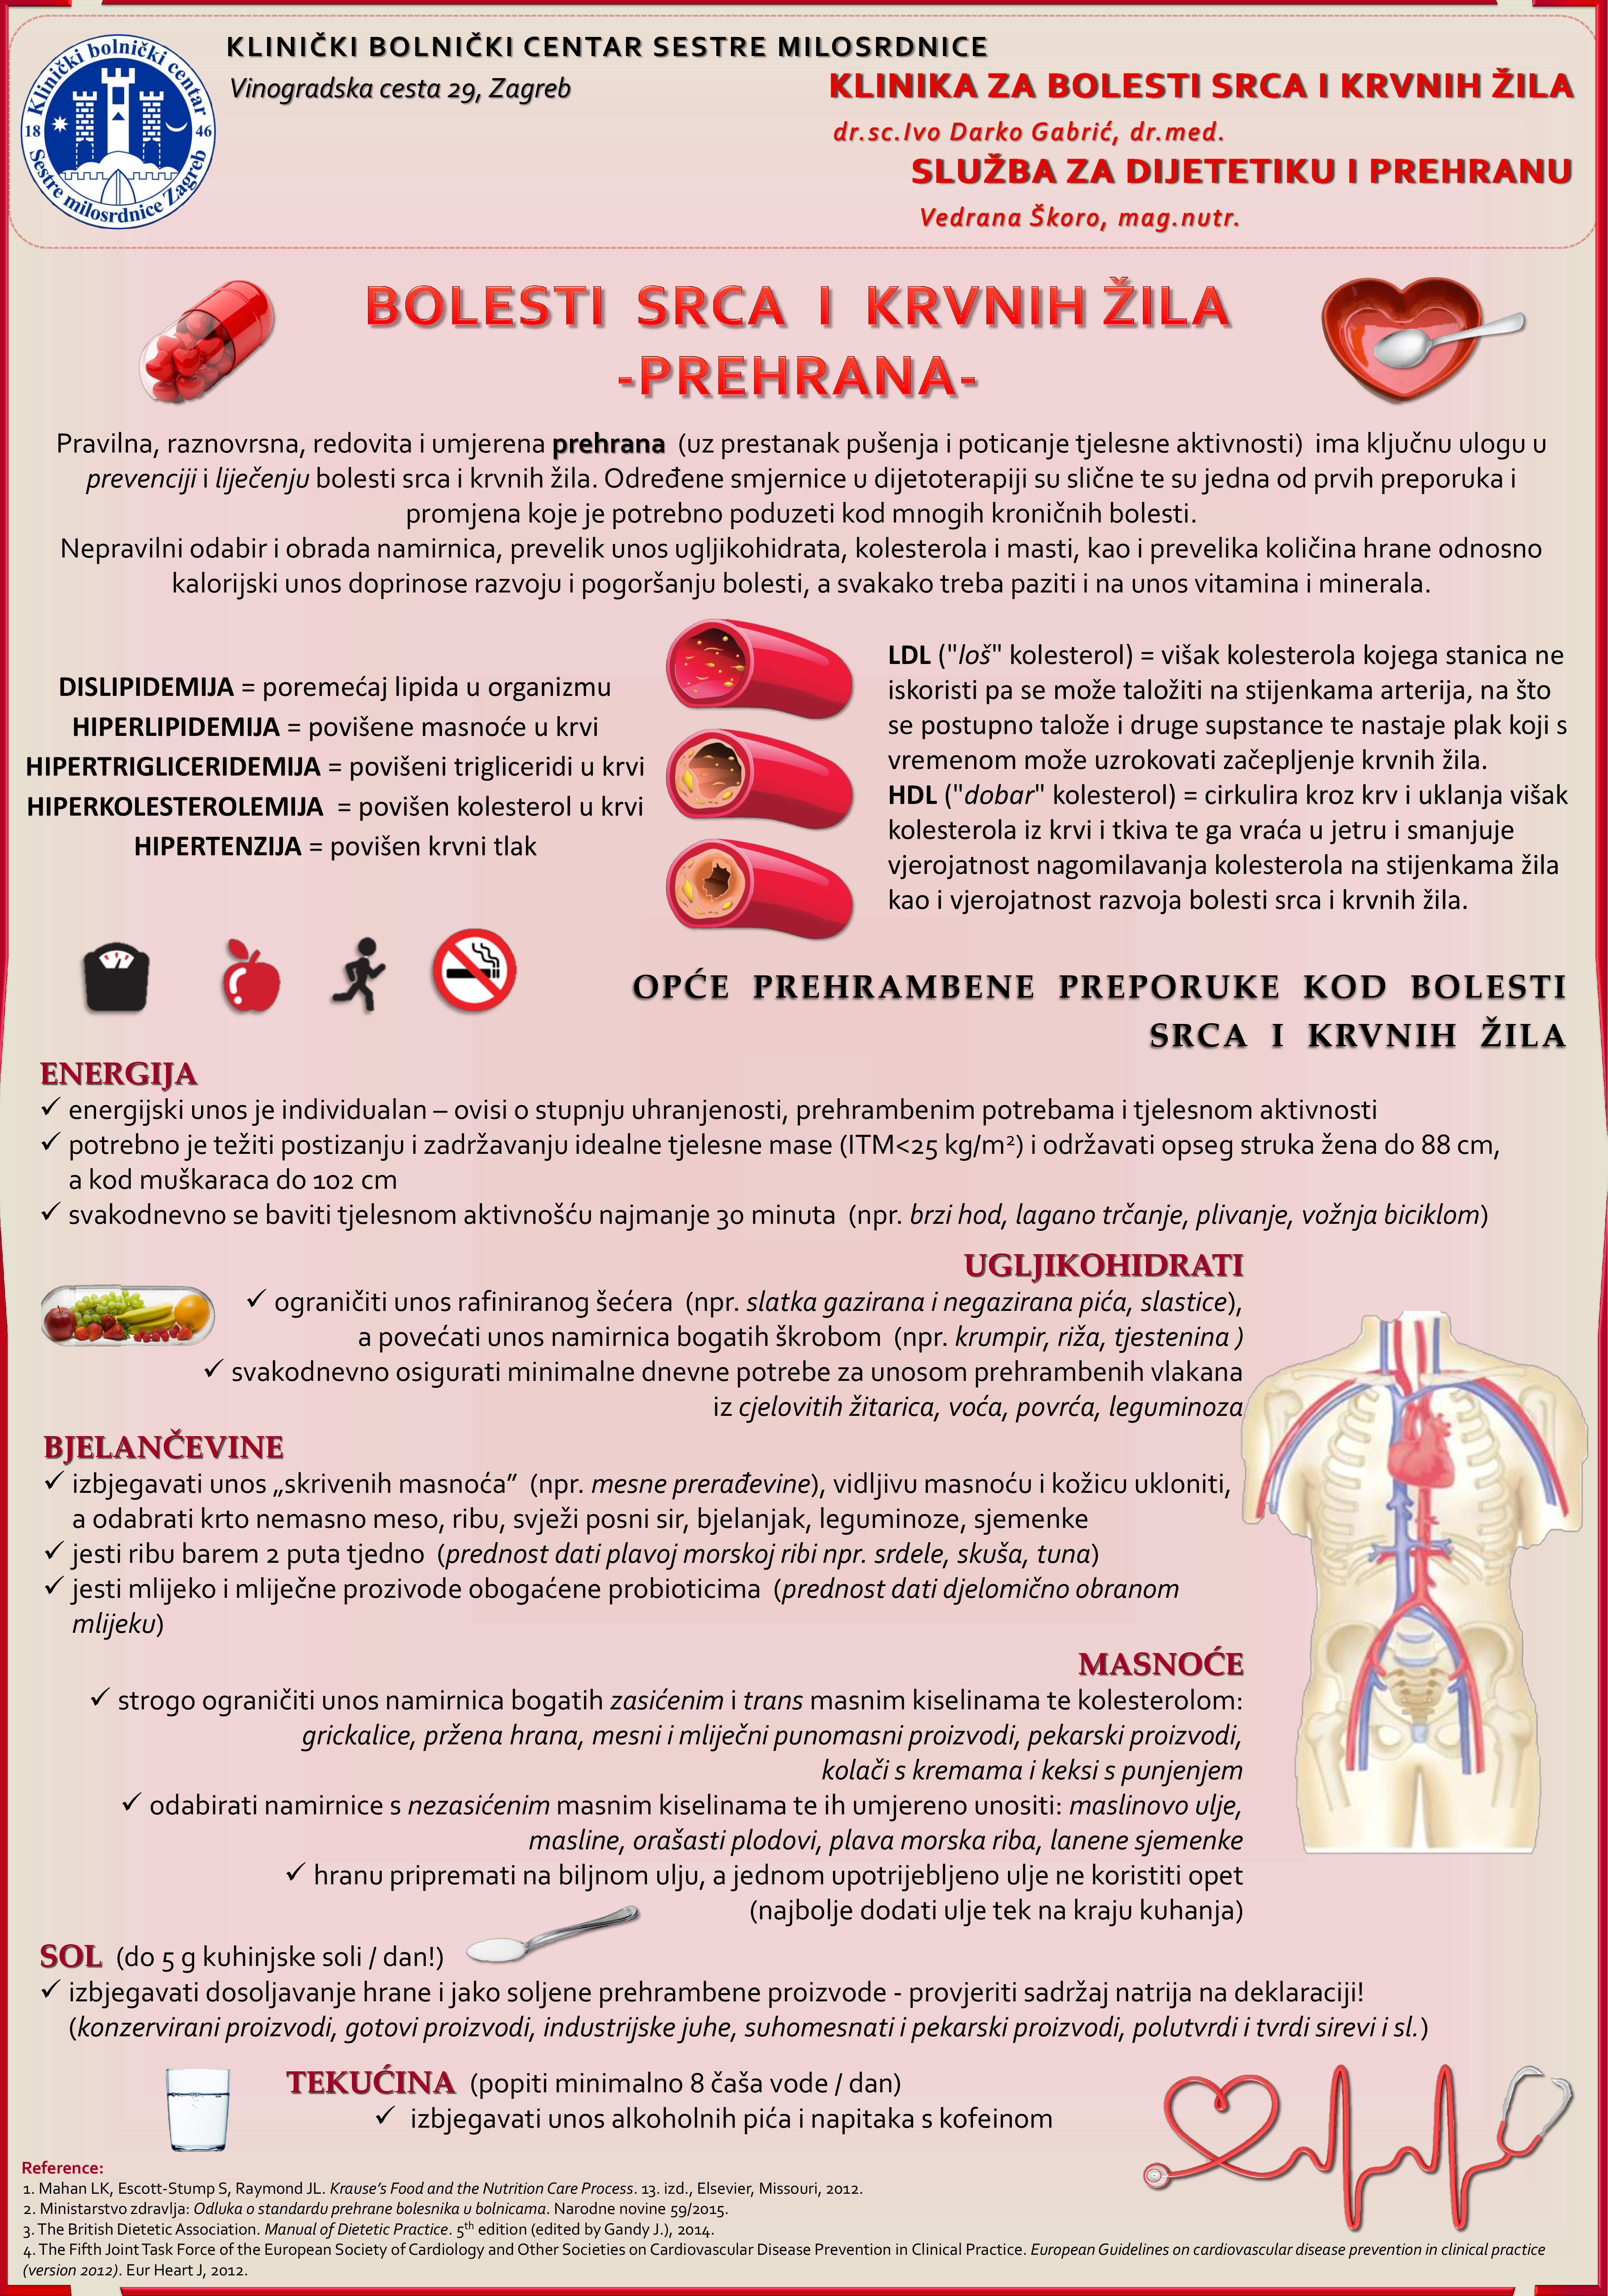 hipertenzija i bolesti srca)